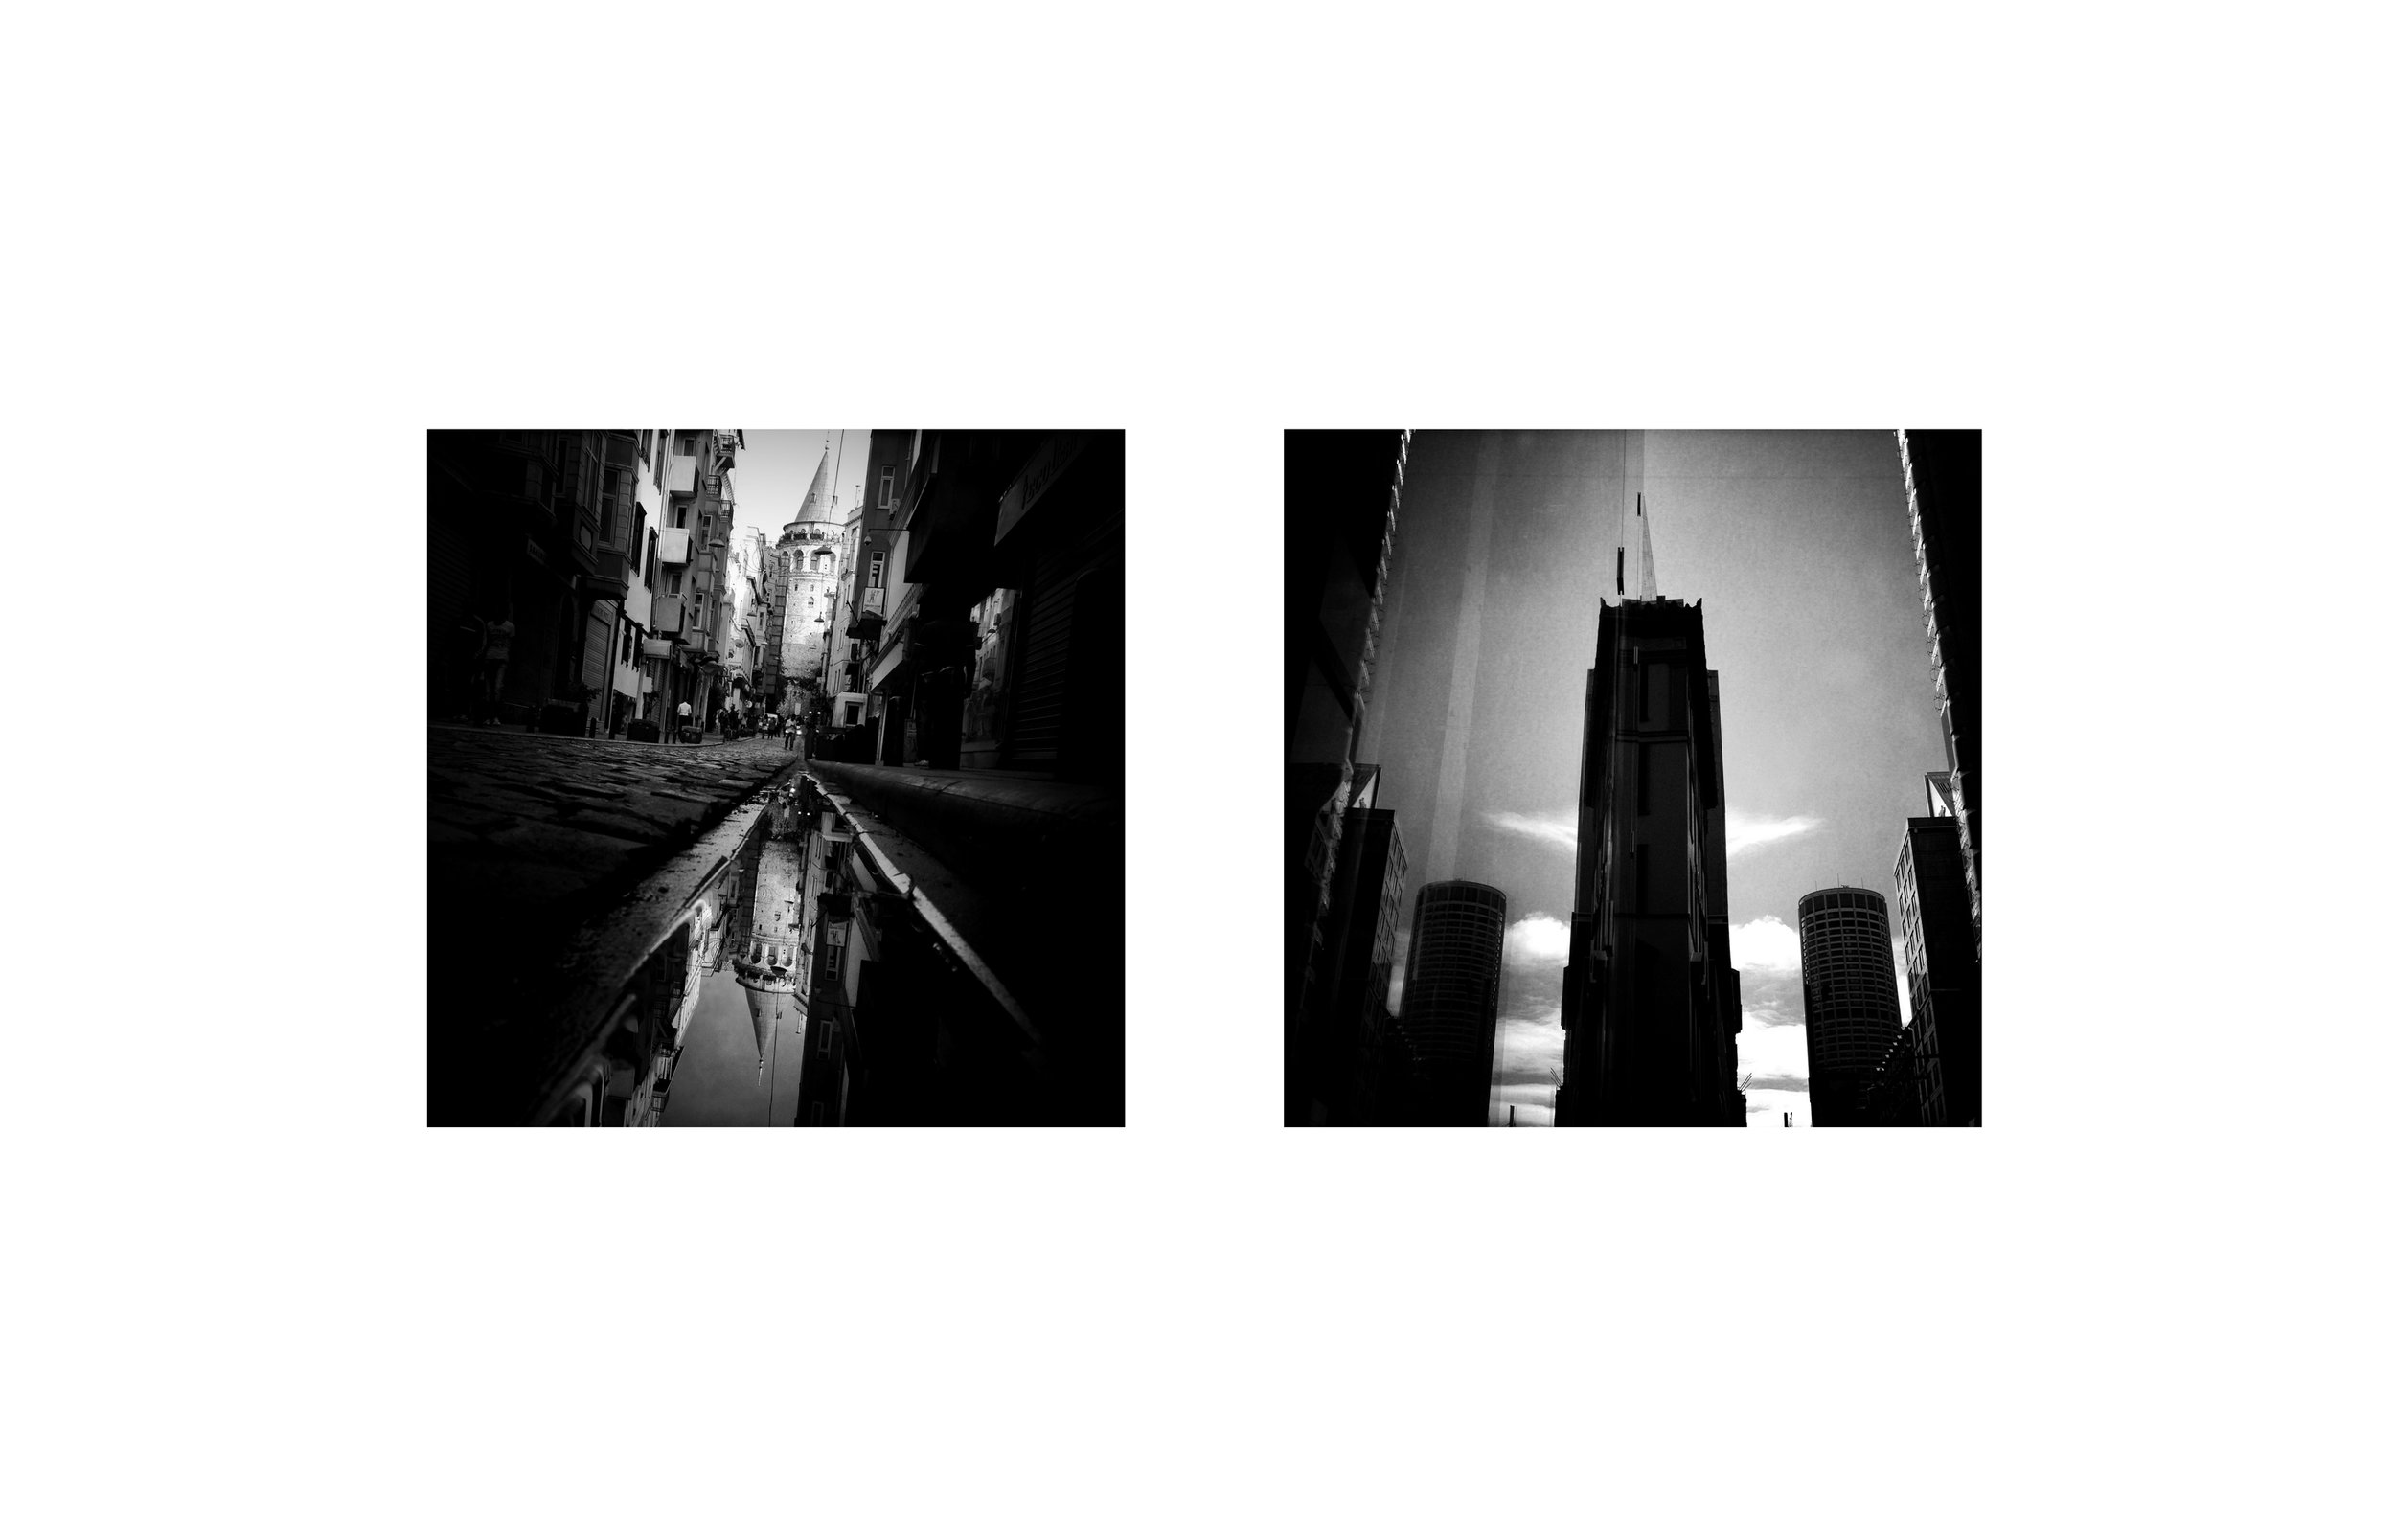 Mirrored_Andersen_Suyabatmaz37.jpg